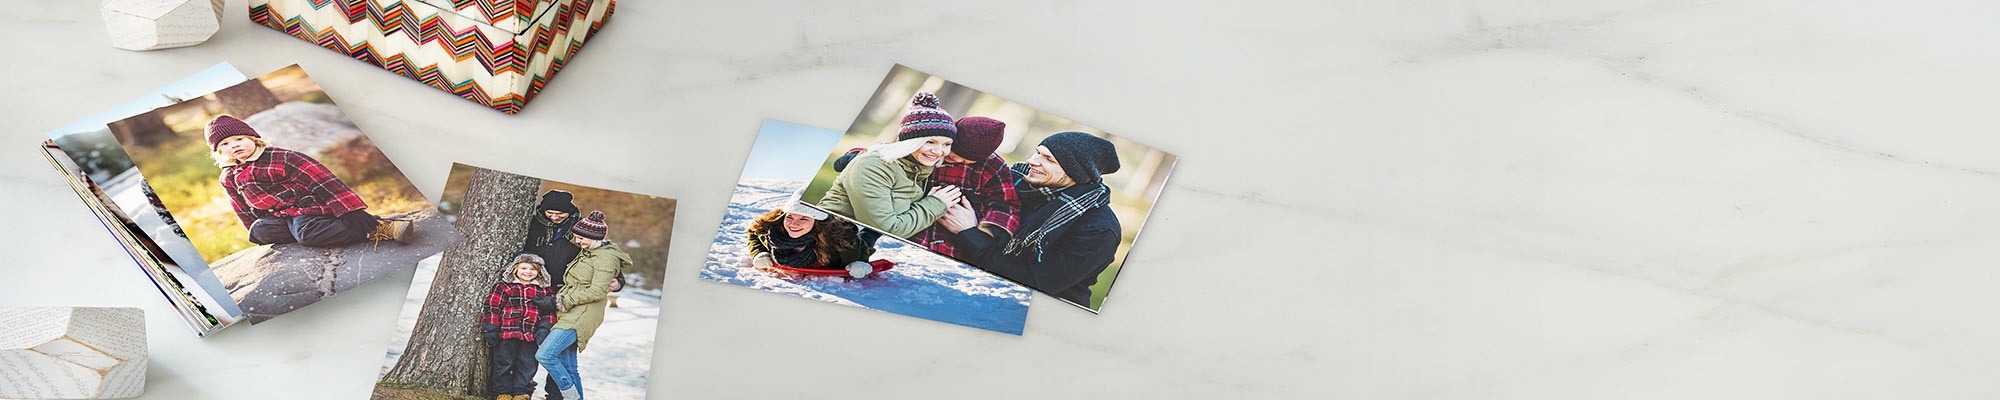 "Order 6x4"" prints image"